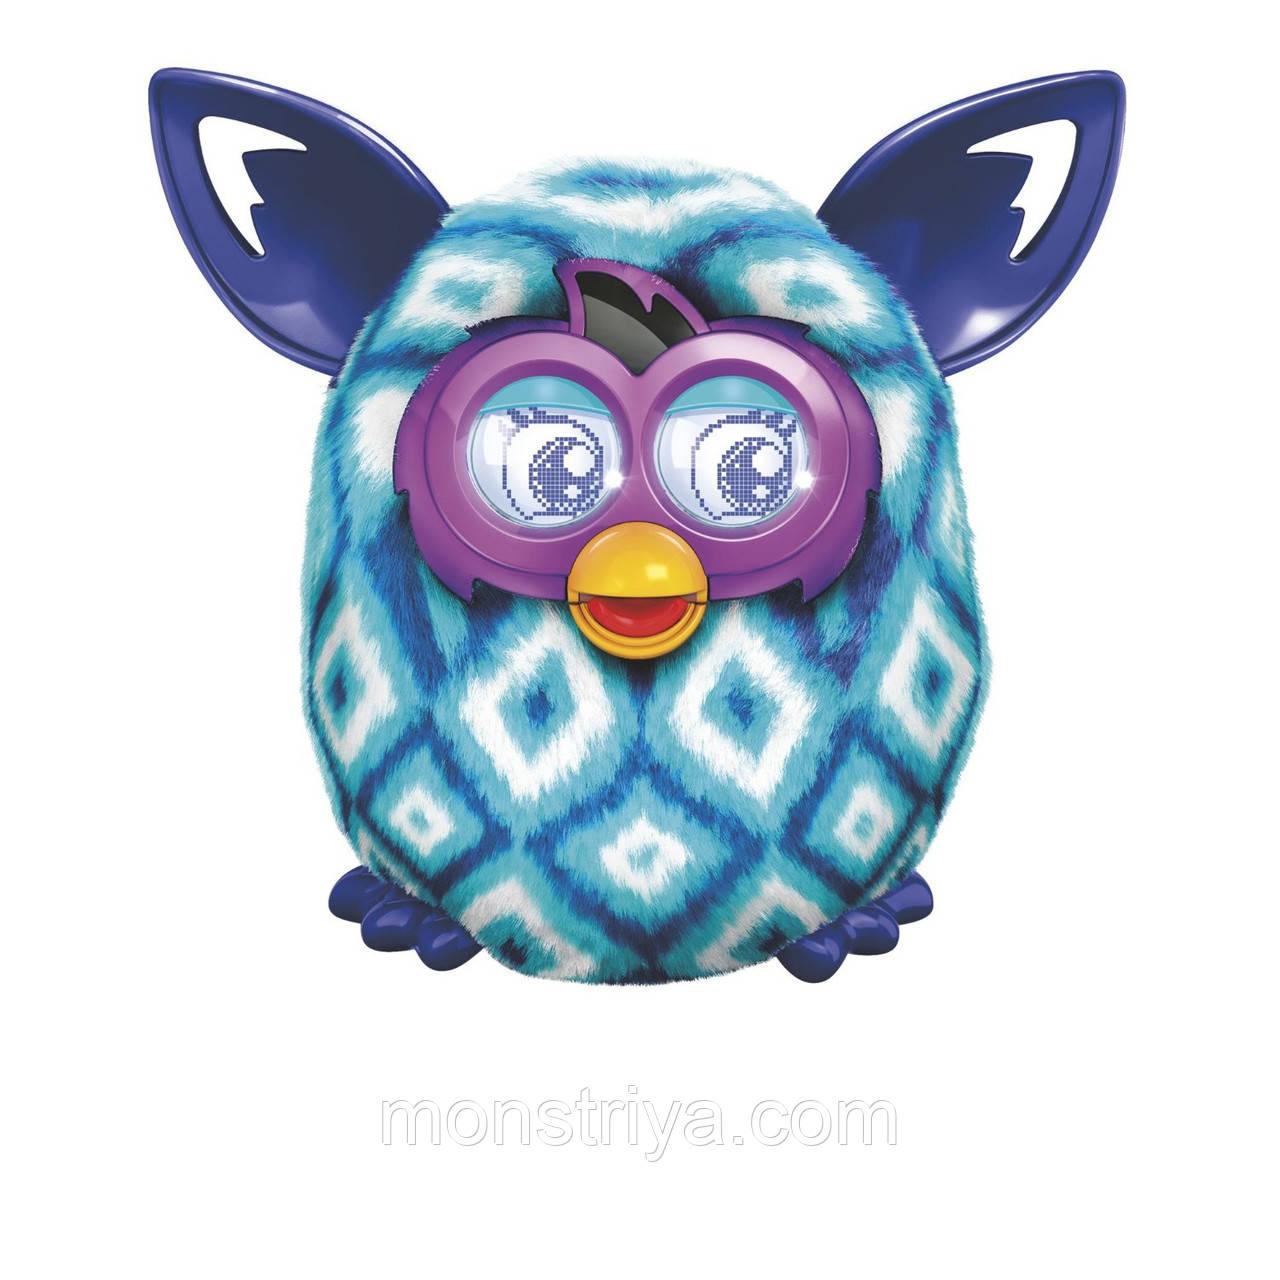 Интерактивный Фёрби Бум Бриллиант. Furby Boom Diamonds оригинал из США. Киев